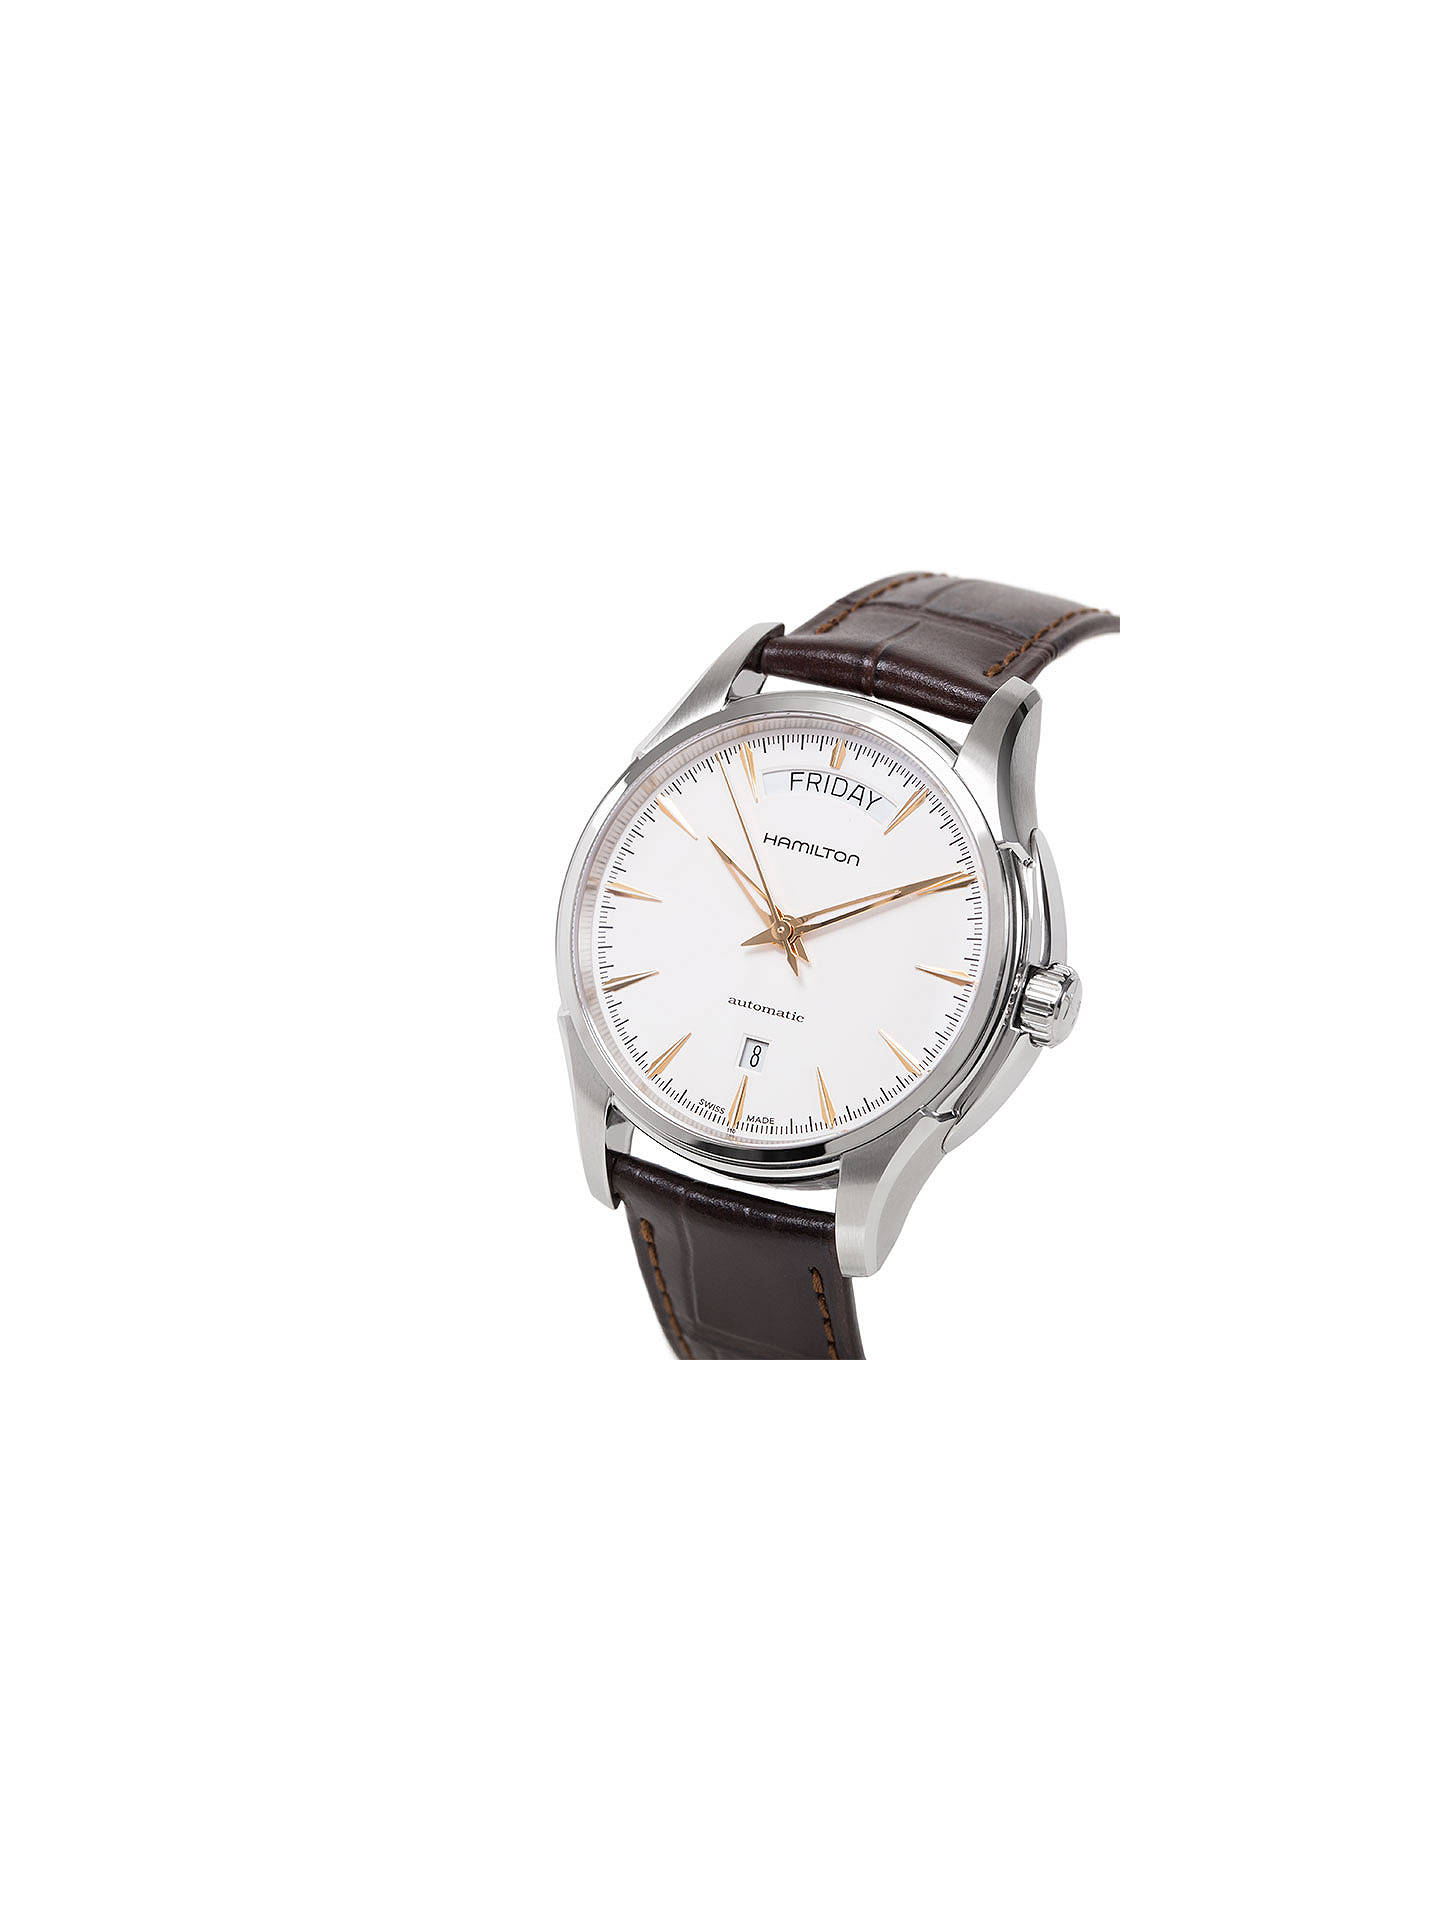 Hamilton H32505511 Men S Jazzmaster Automatic Day Date Leather Strap Watch Dark Brown White